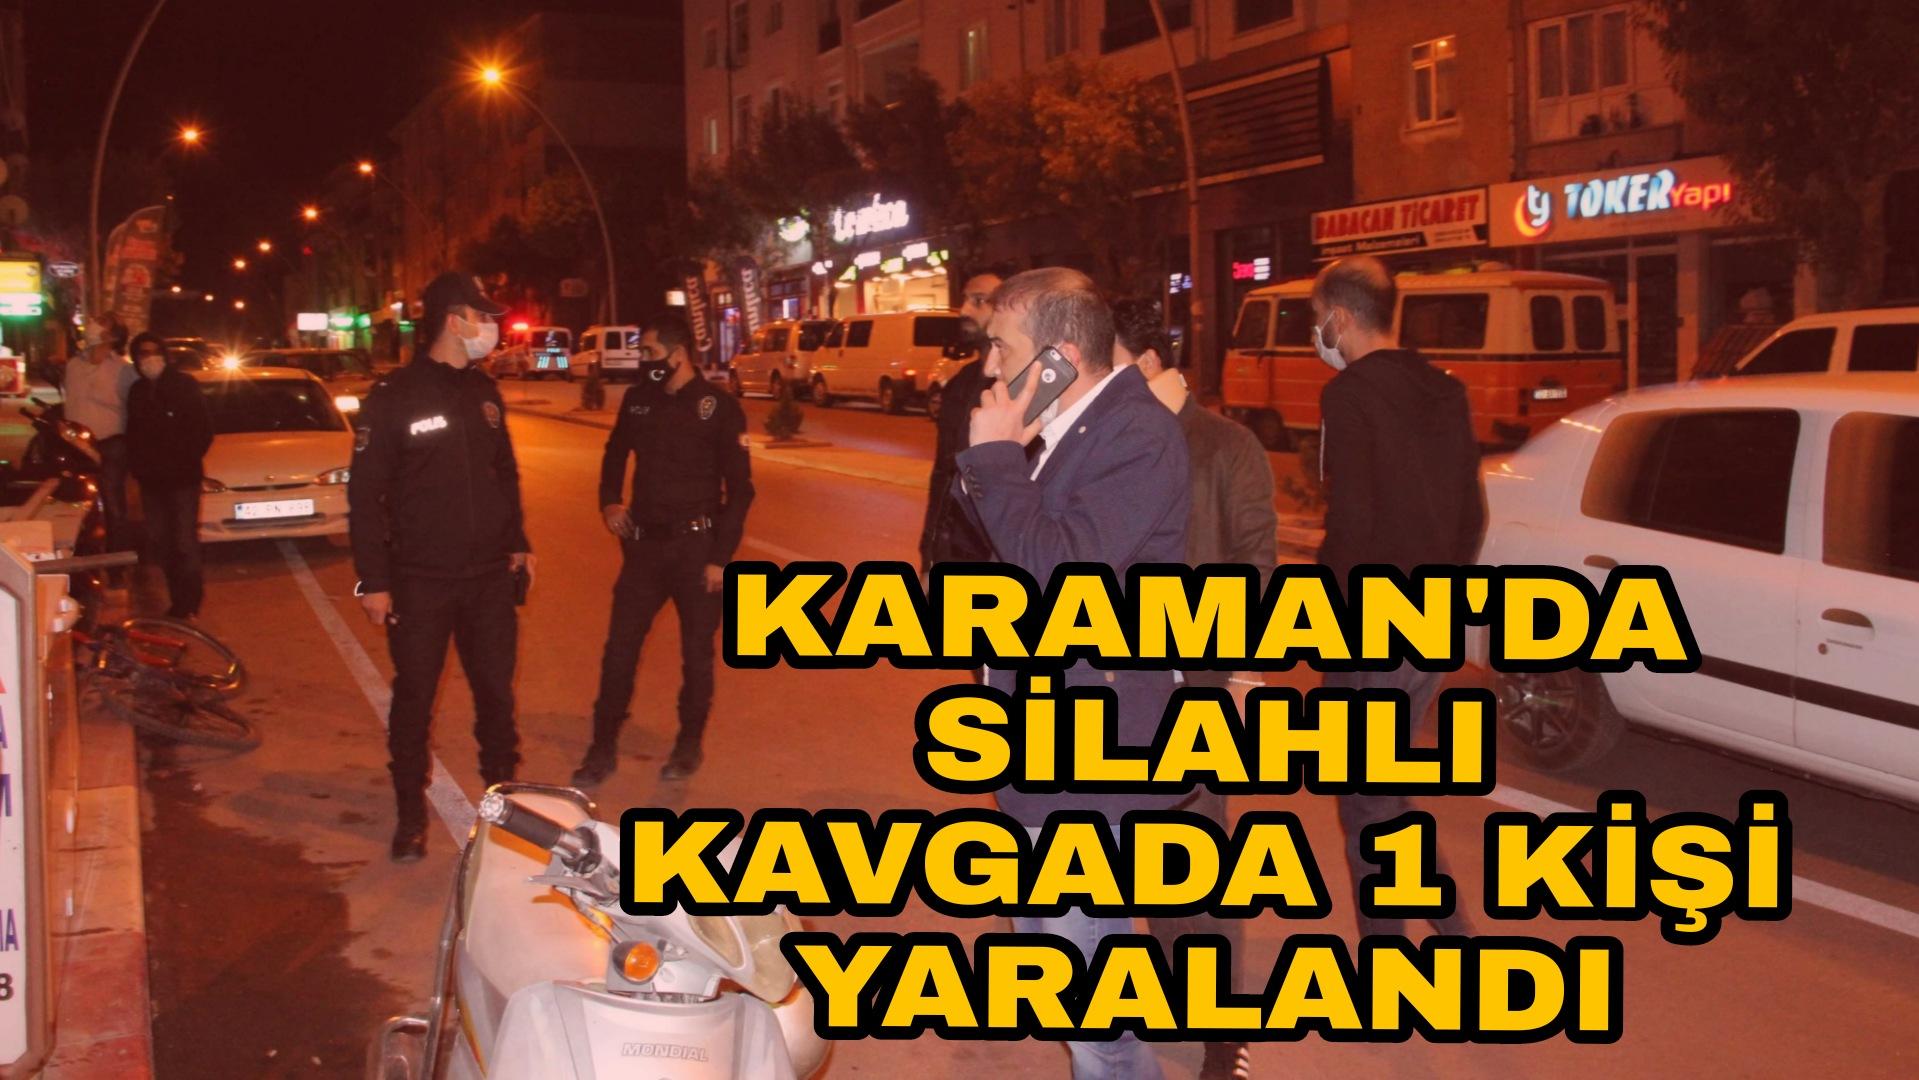 KARAMAN'DA SİLAHLİ KAVGADA 1 KİŞİ YARALANDI